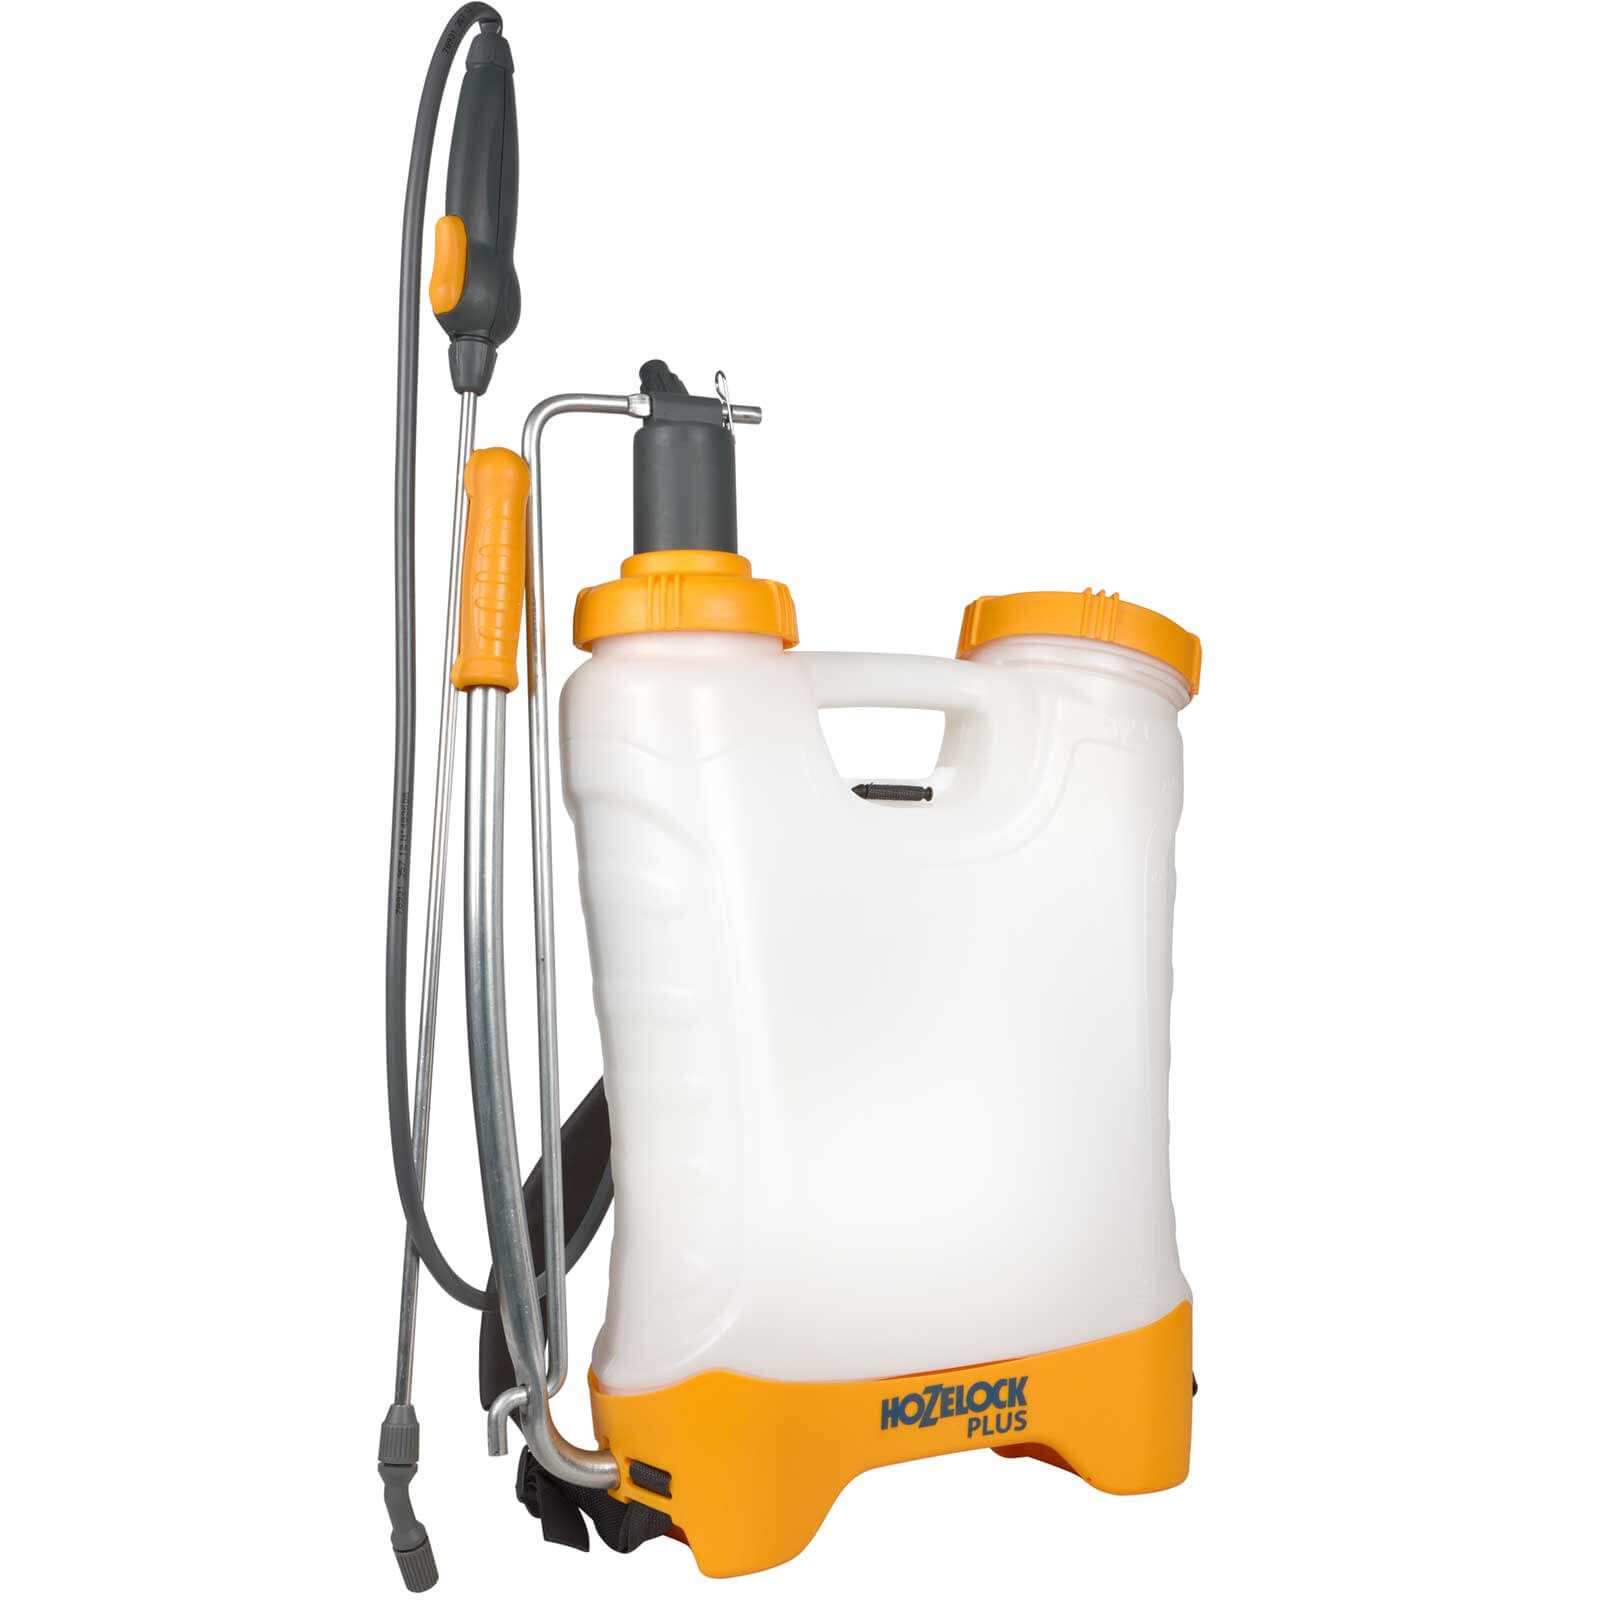 Hozelock PULSAR PLUS Comfort Knapsack Water Pressure Sprayer 12l